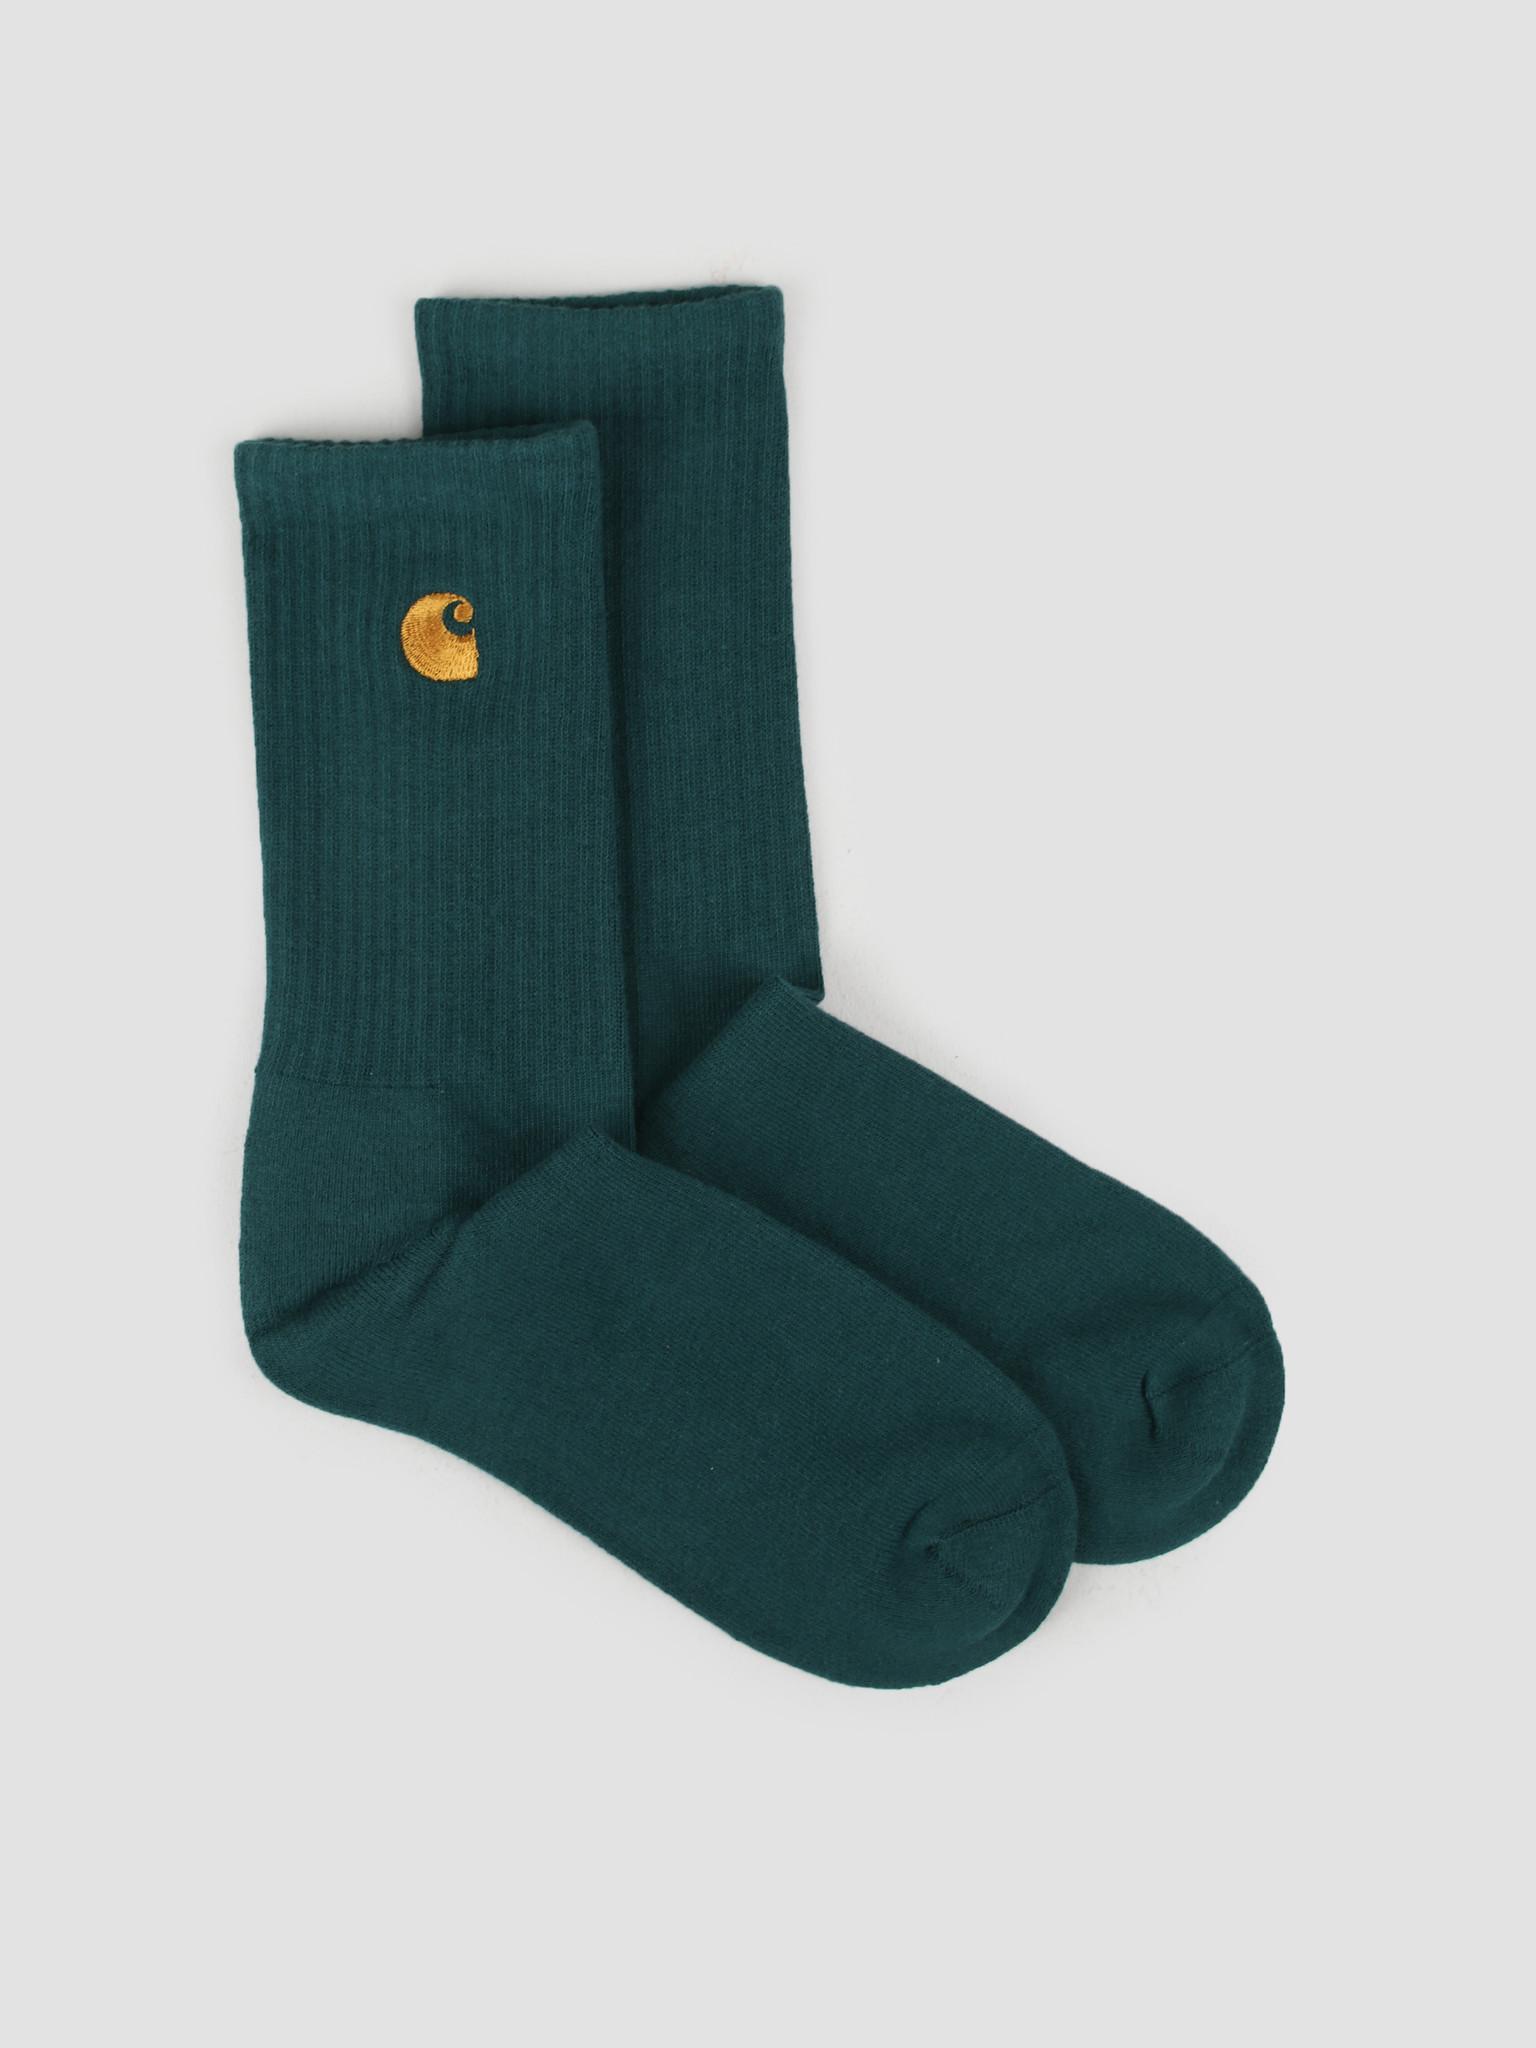 Carhartt WIP Carhartt WIP Chase Socks Treehouse Gold I026527-08Z90